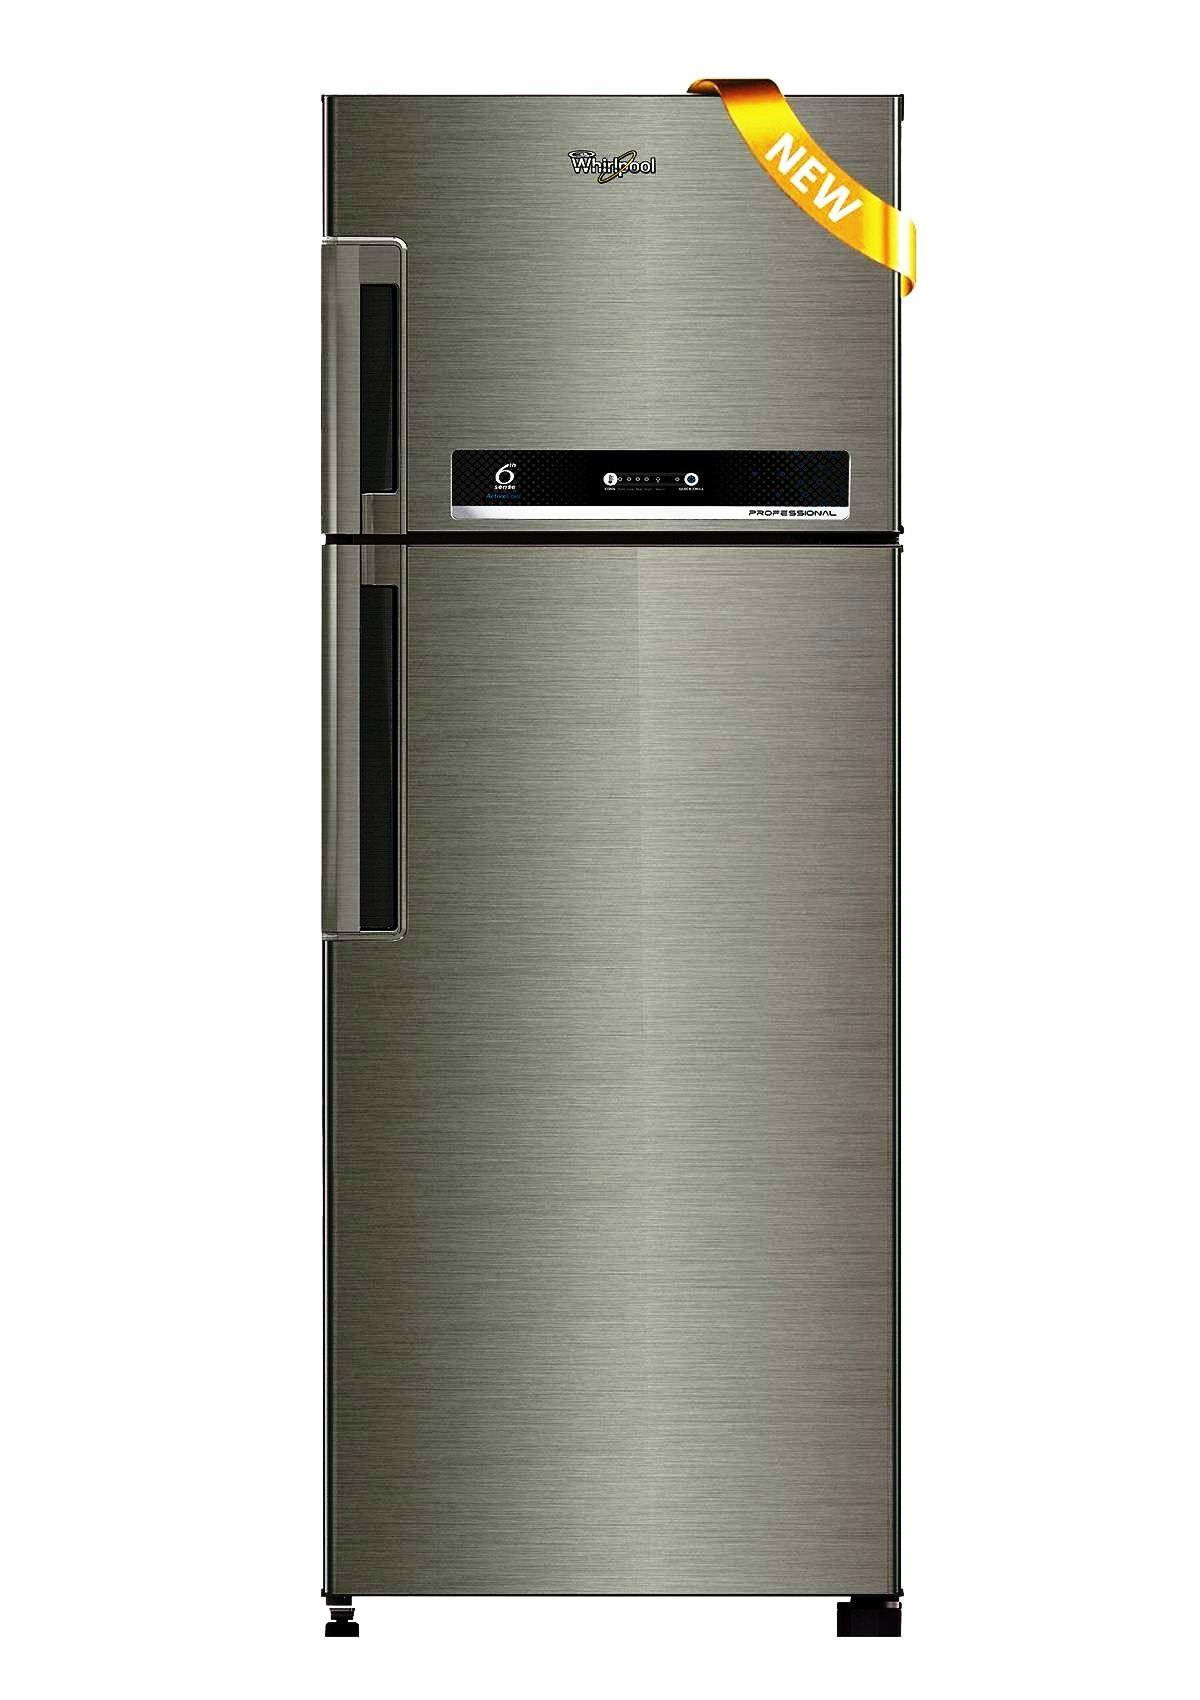 Smart Whirlpool Professional Elite Refrigerators in India | Gadgets ...